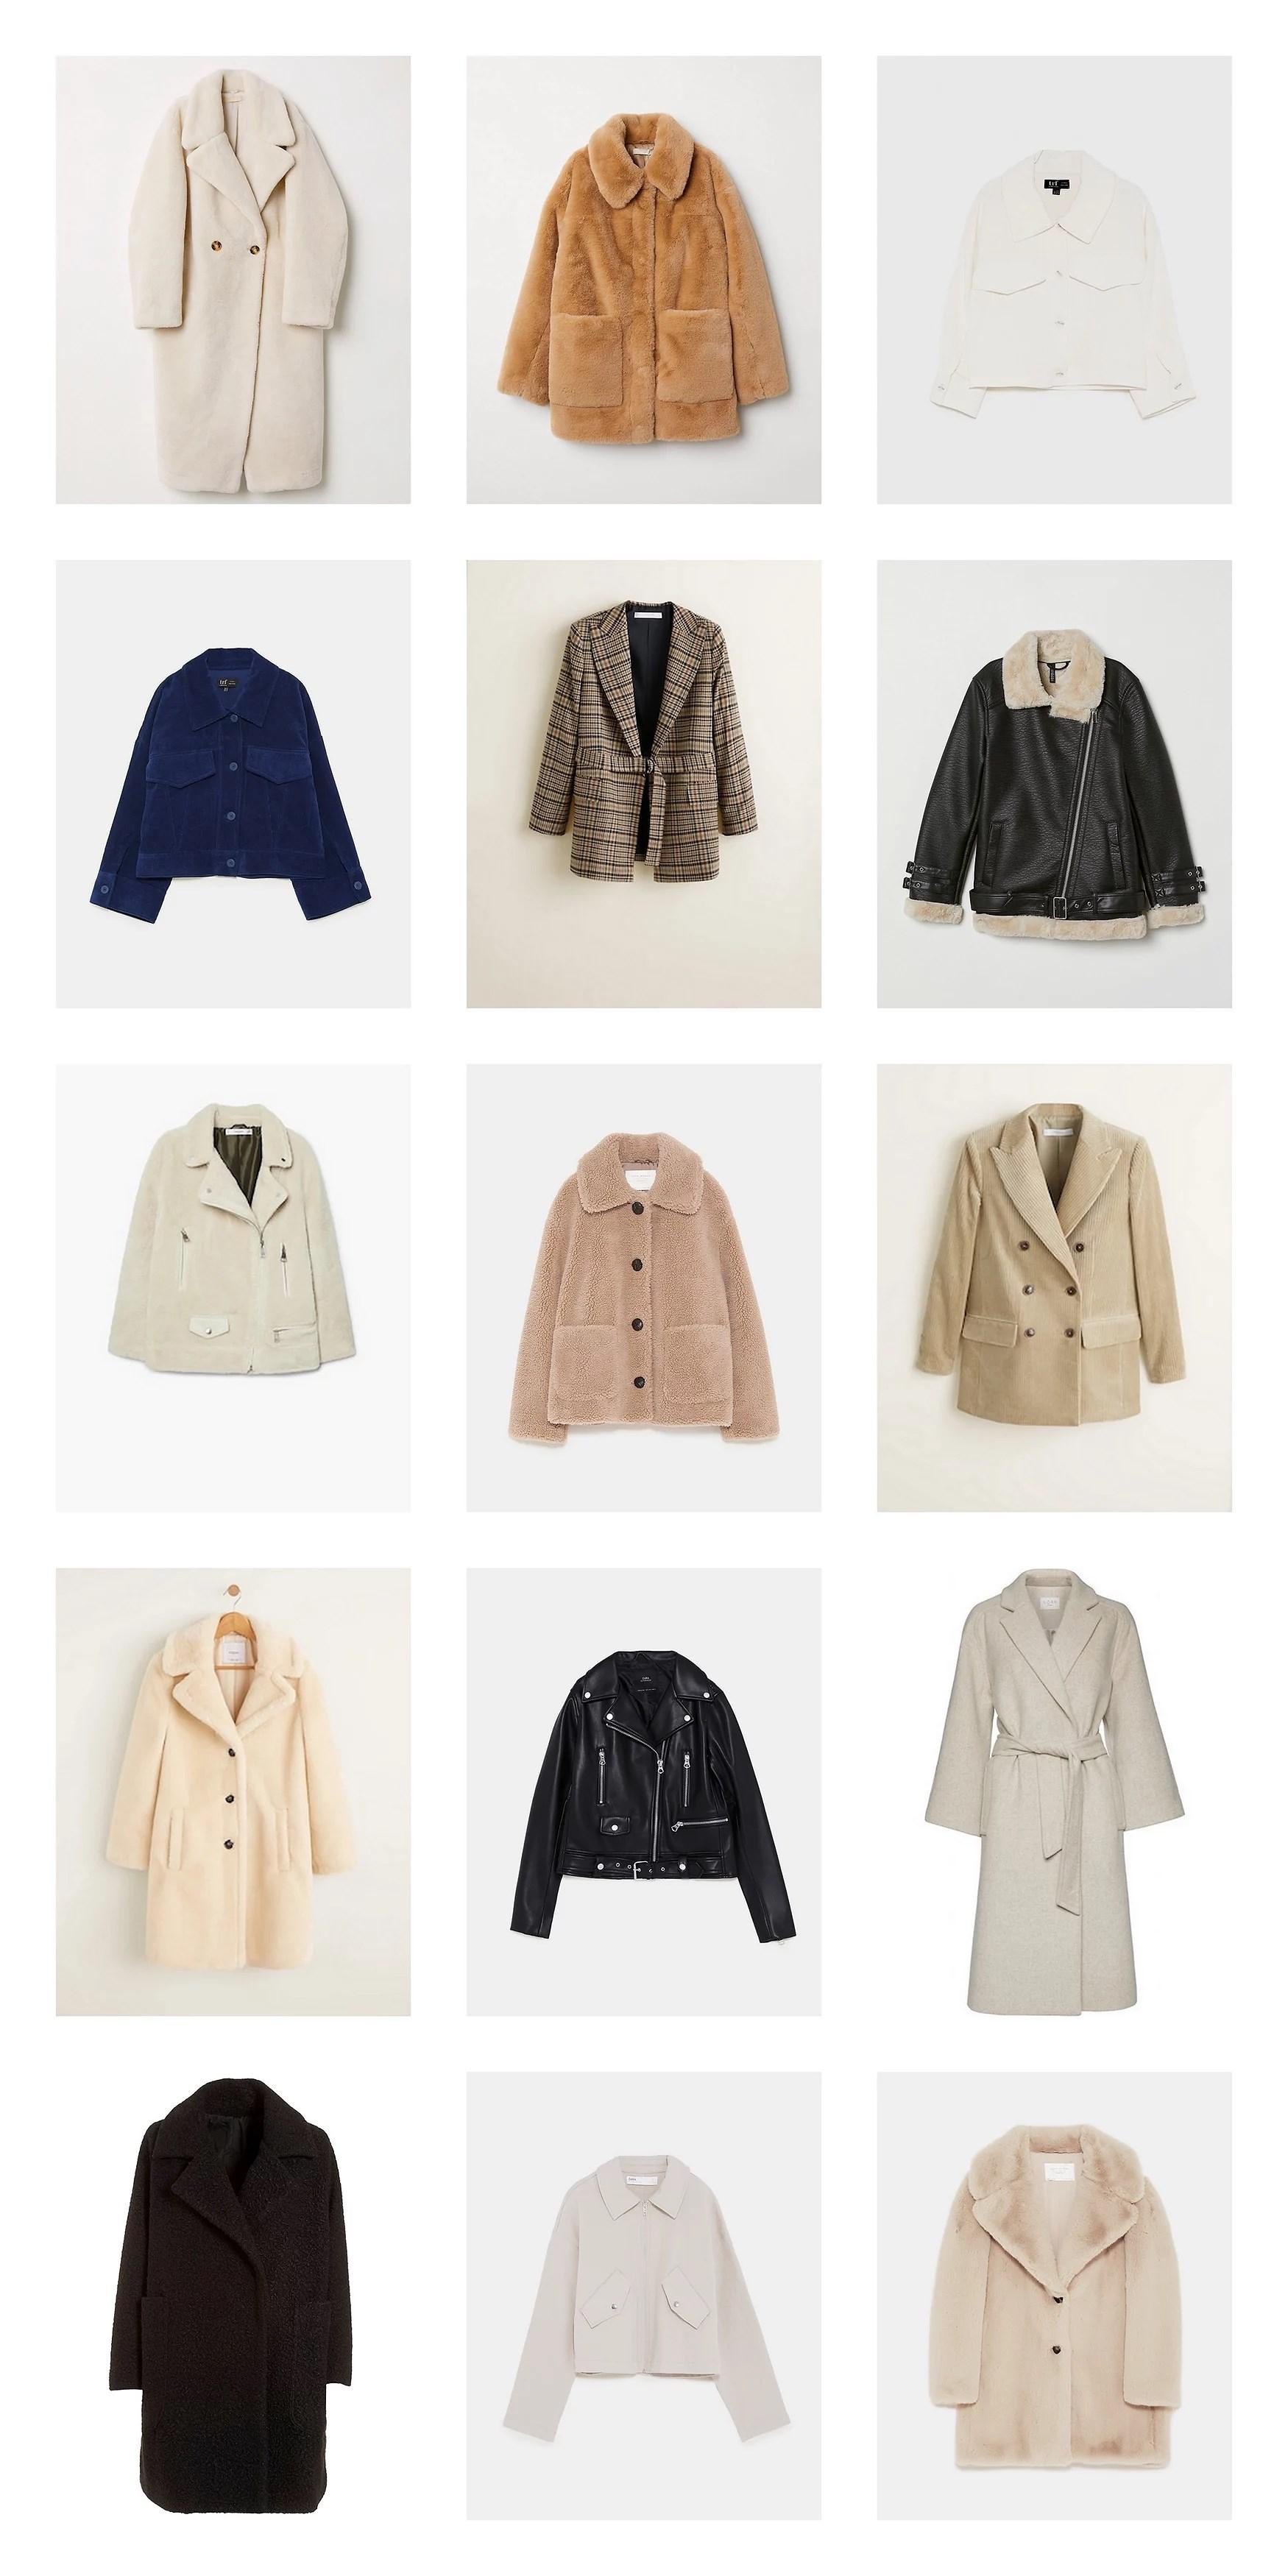 Høstens fineste jakker